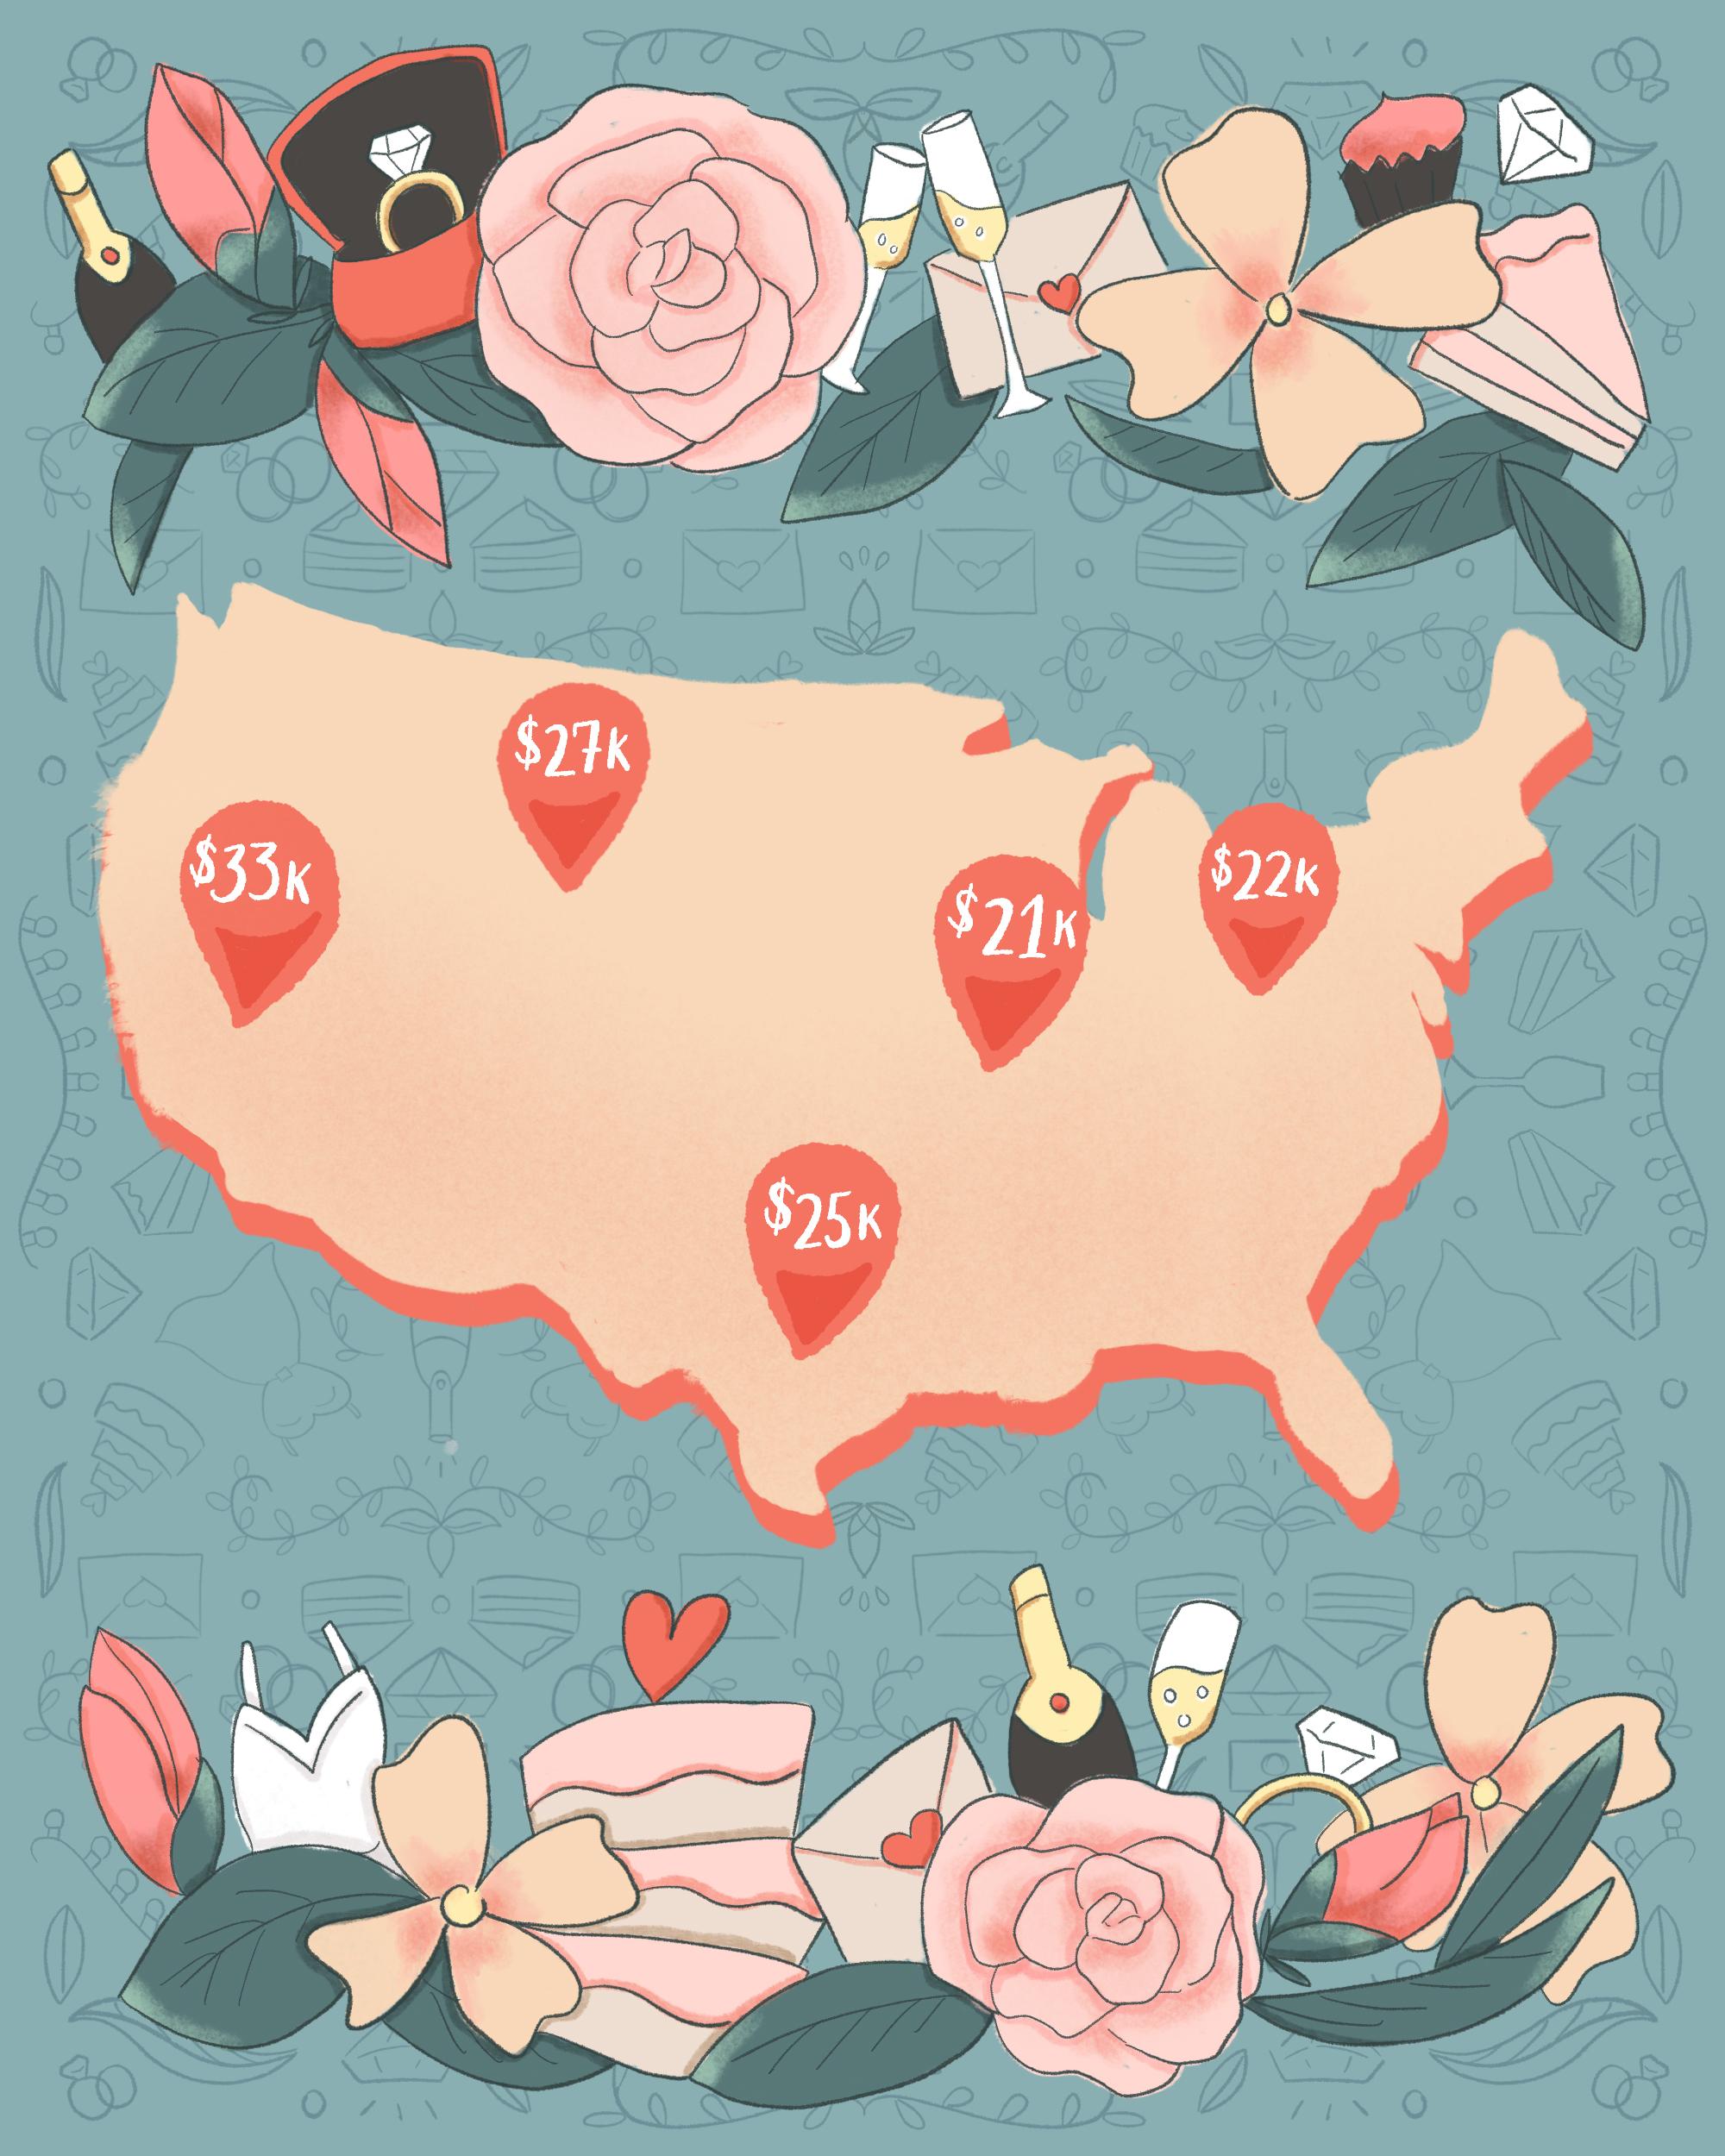 state wedding costs illustration